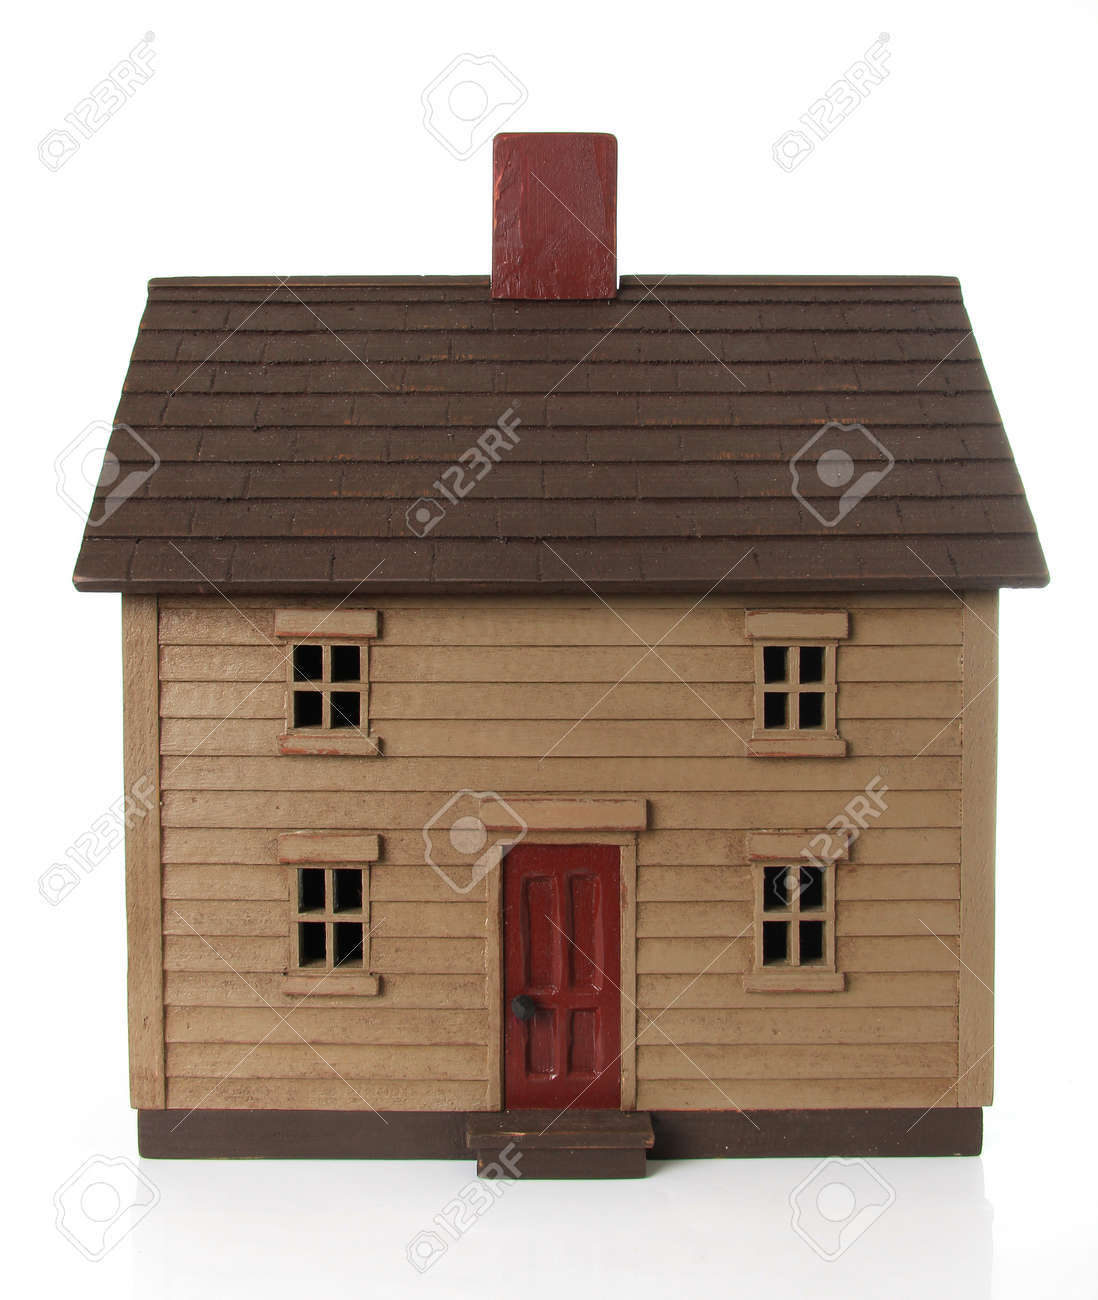 Shaker style house model Stock Photo - 15422513